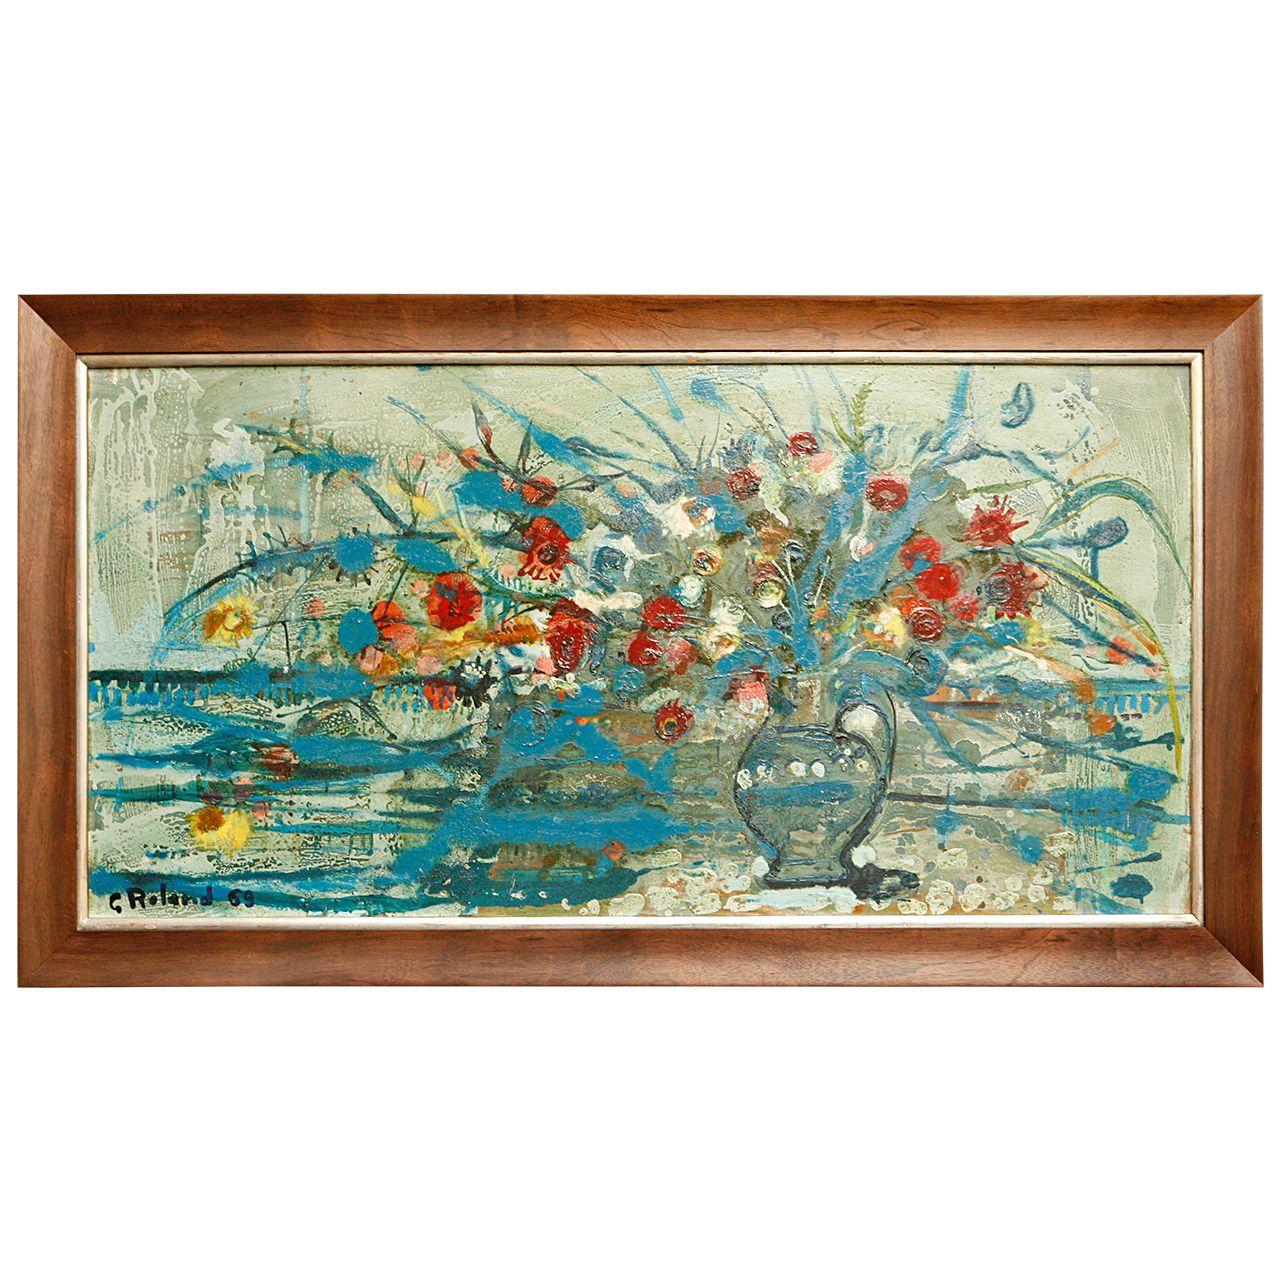 Modern Floral Still Life Painting, 1969 - http://bit.ly/1z7Q3hK